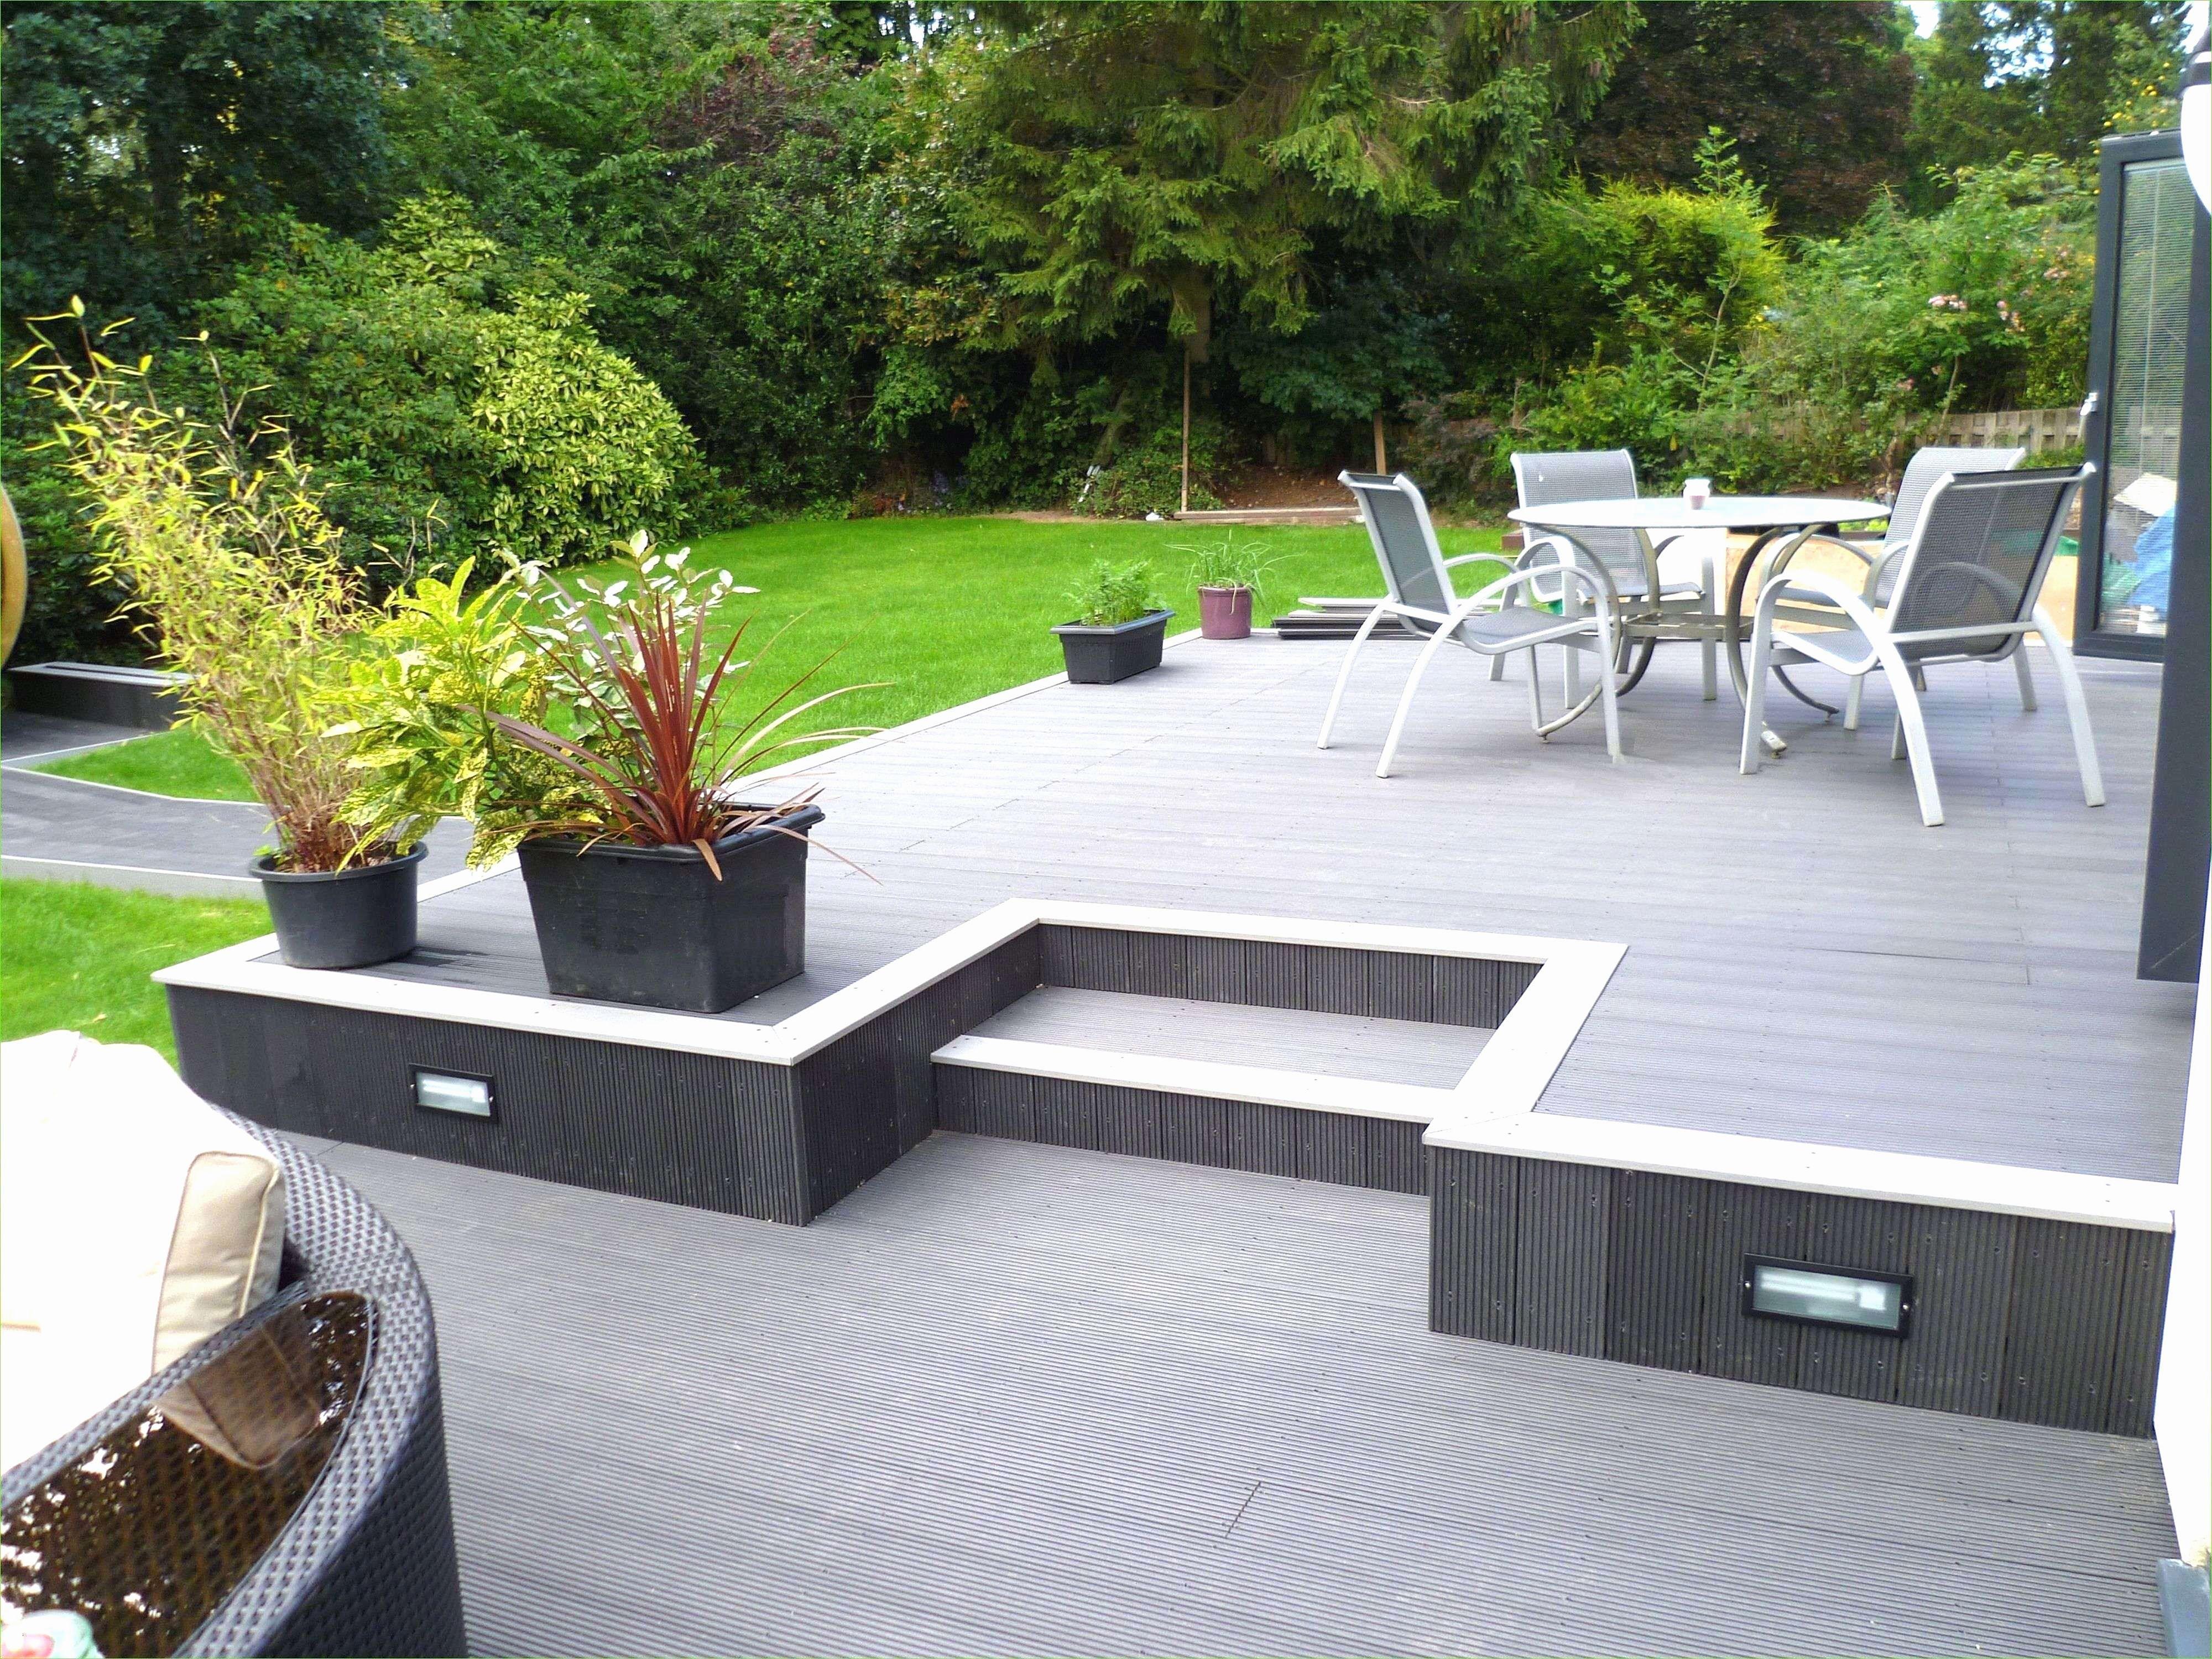 17 Modern And Unique Backyard Deck Ideas For Inspiration Decor Gardening Ideas Deck Designs Backyard Patio Deck Designs Patio Design Modern backyard deck design ideas